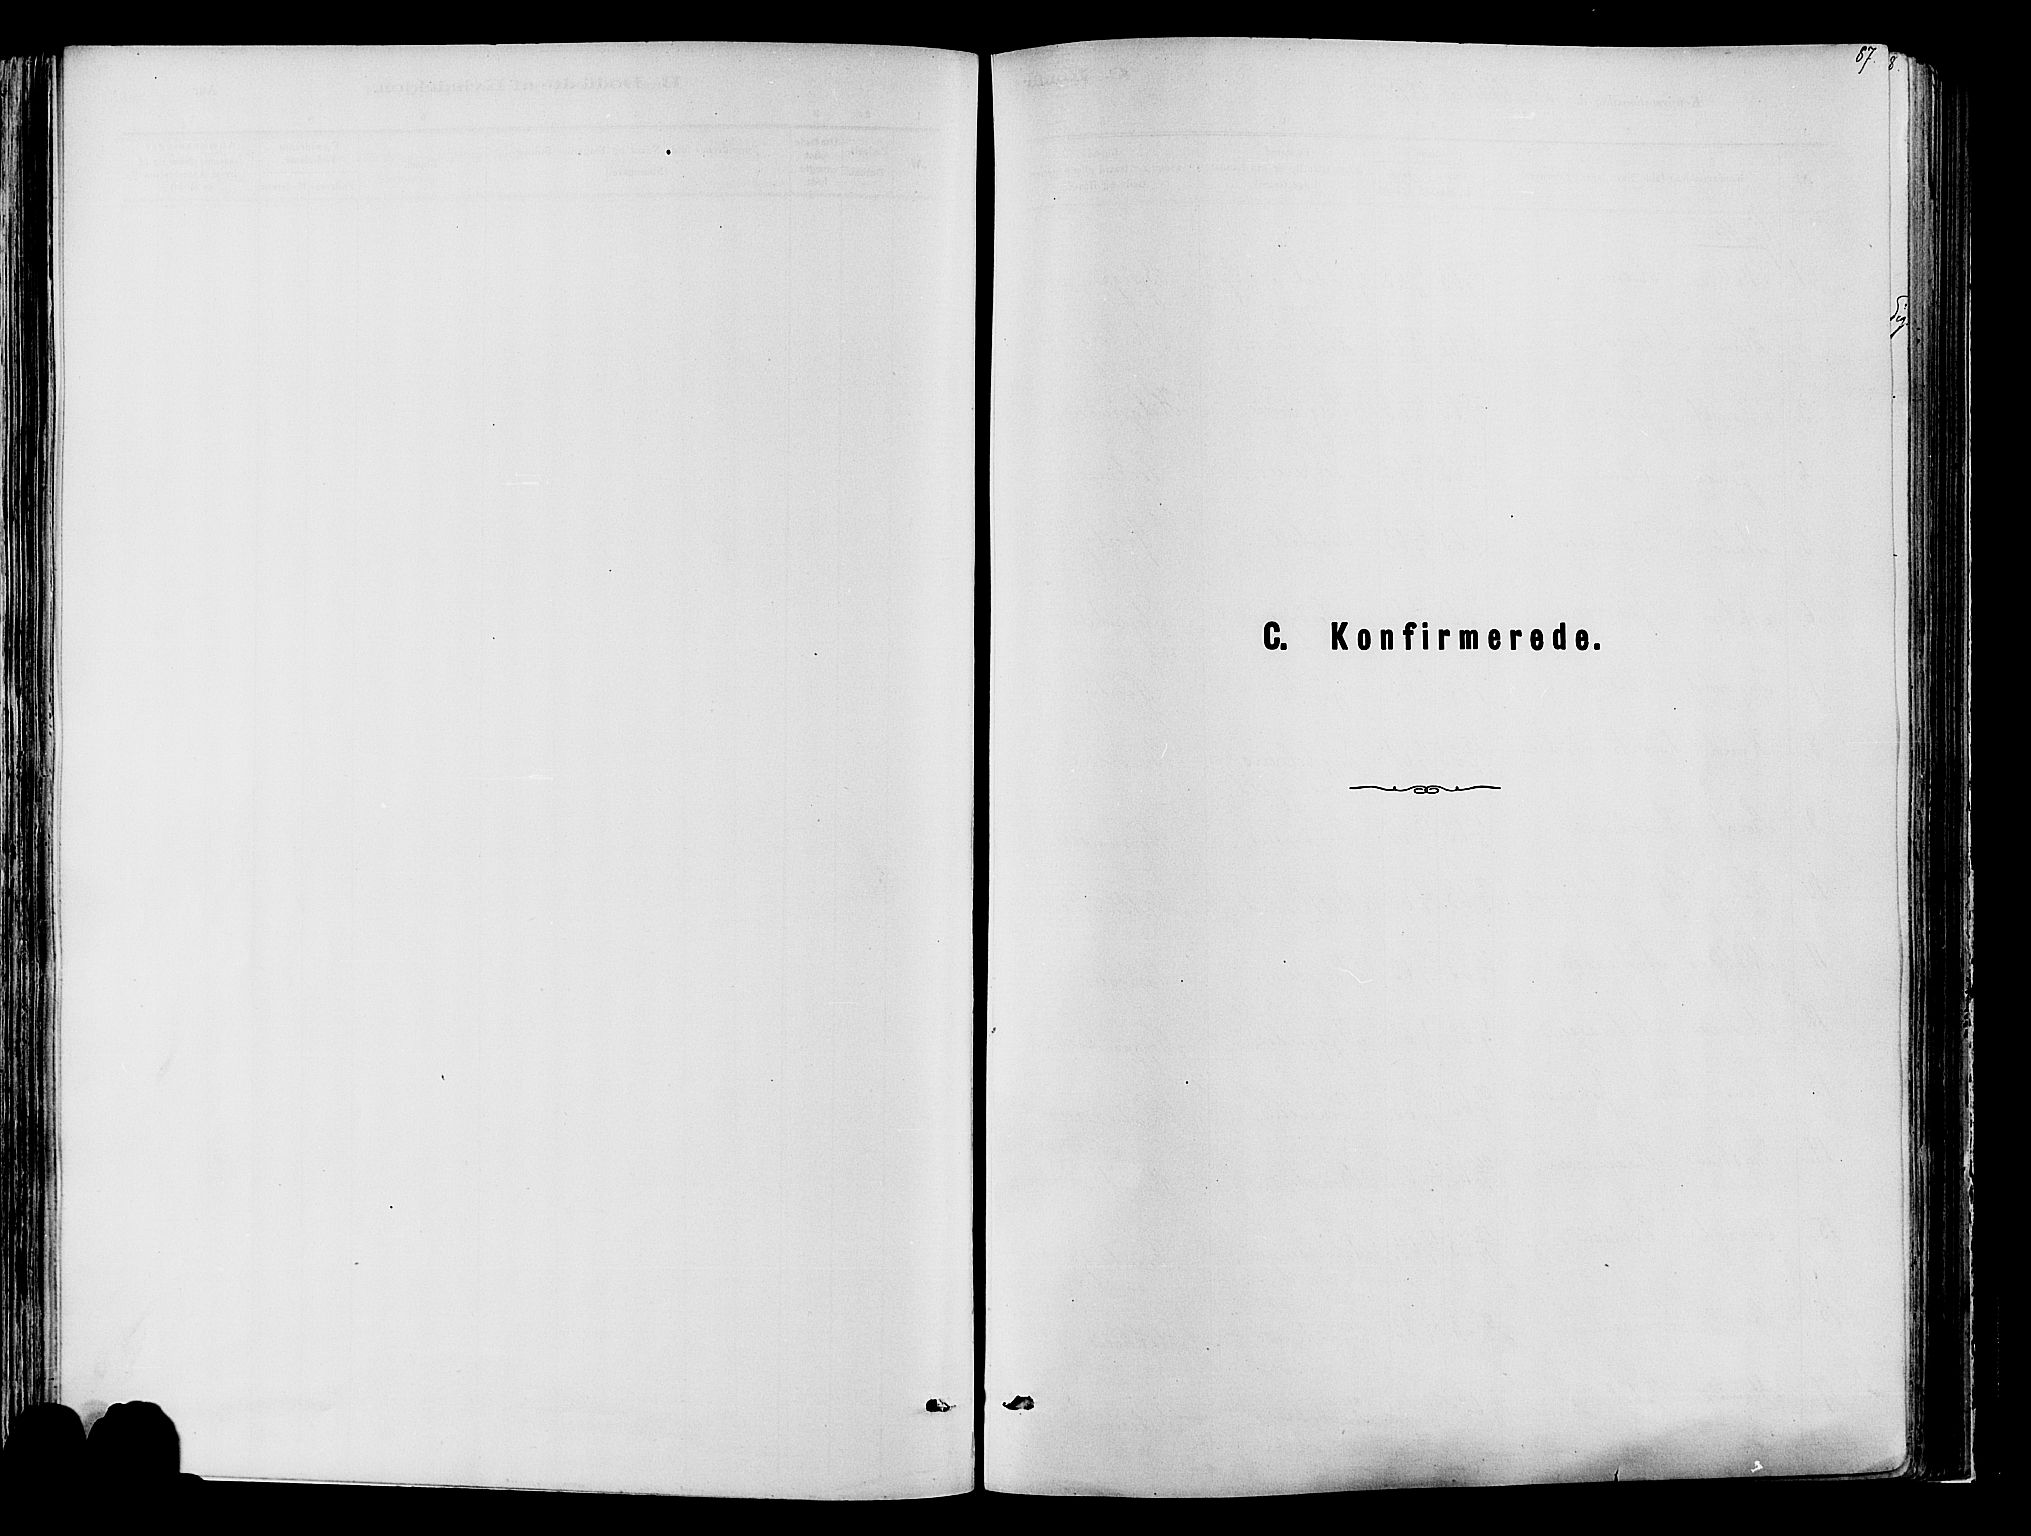 SAH, Vardal prestekontor, H/Ha/Haa/L0009: Ministerialbok nr. 9, 1878-1892, s. 87